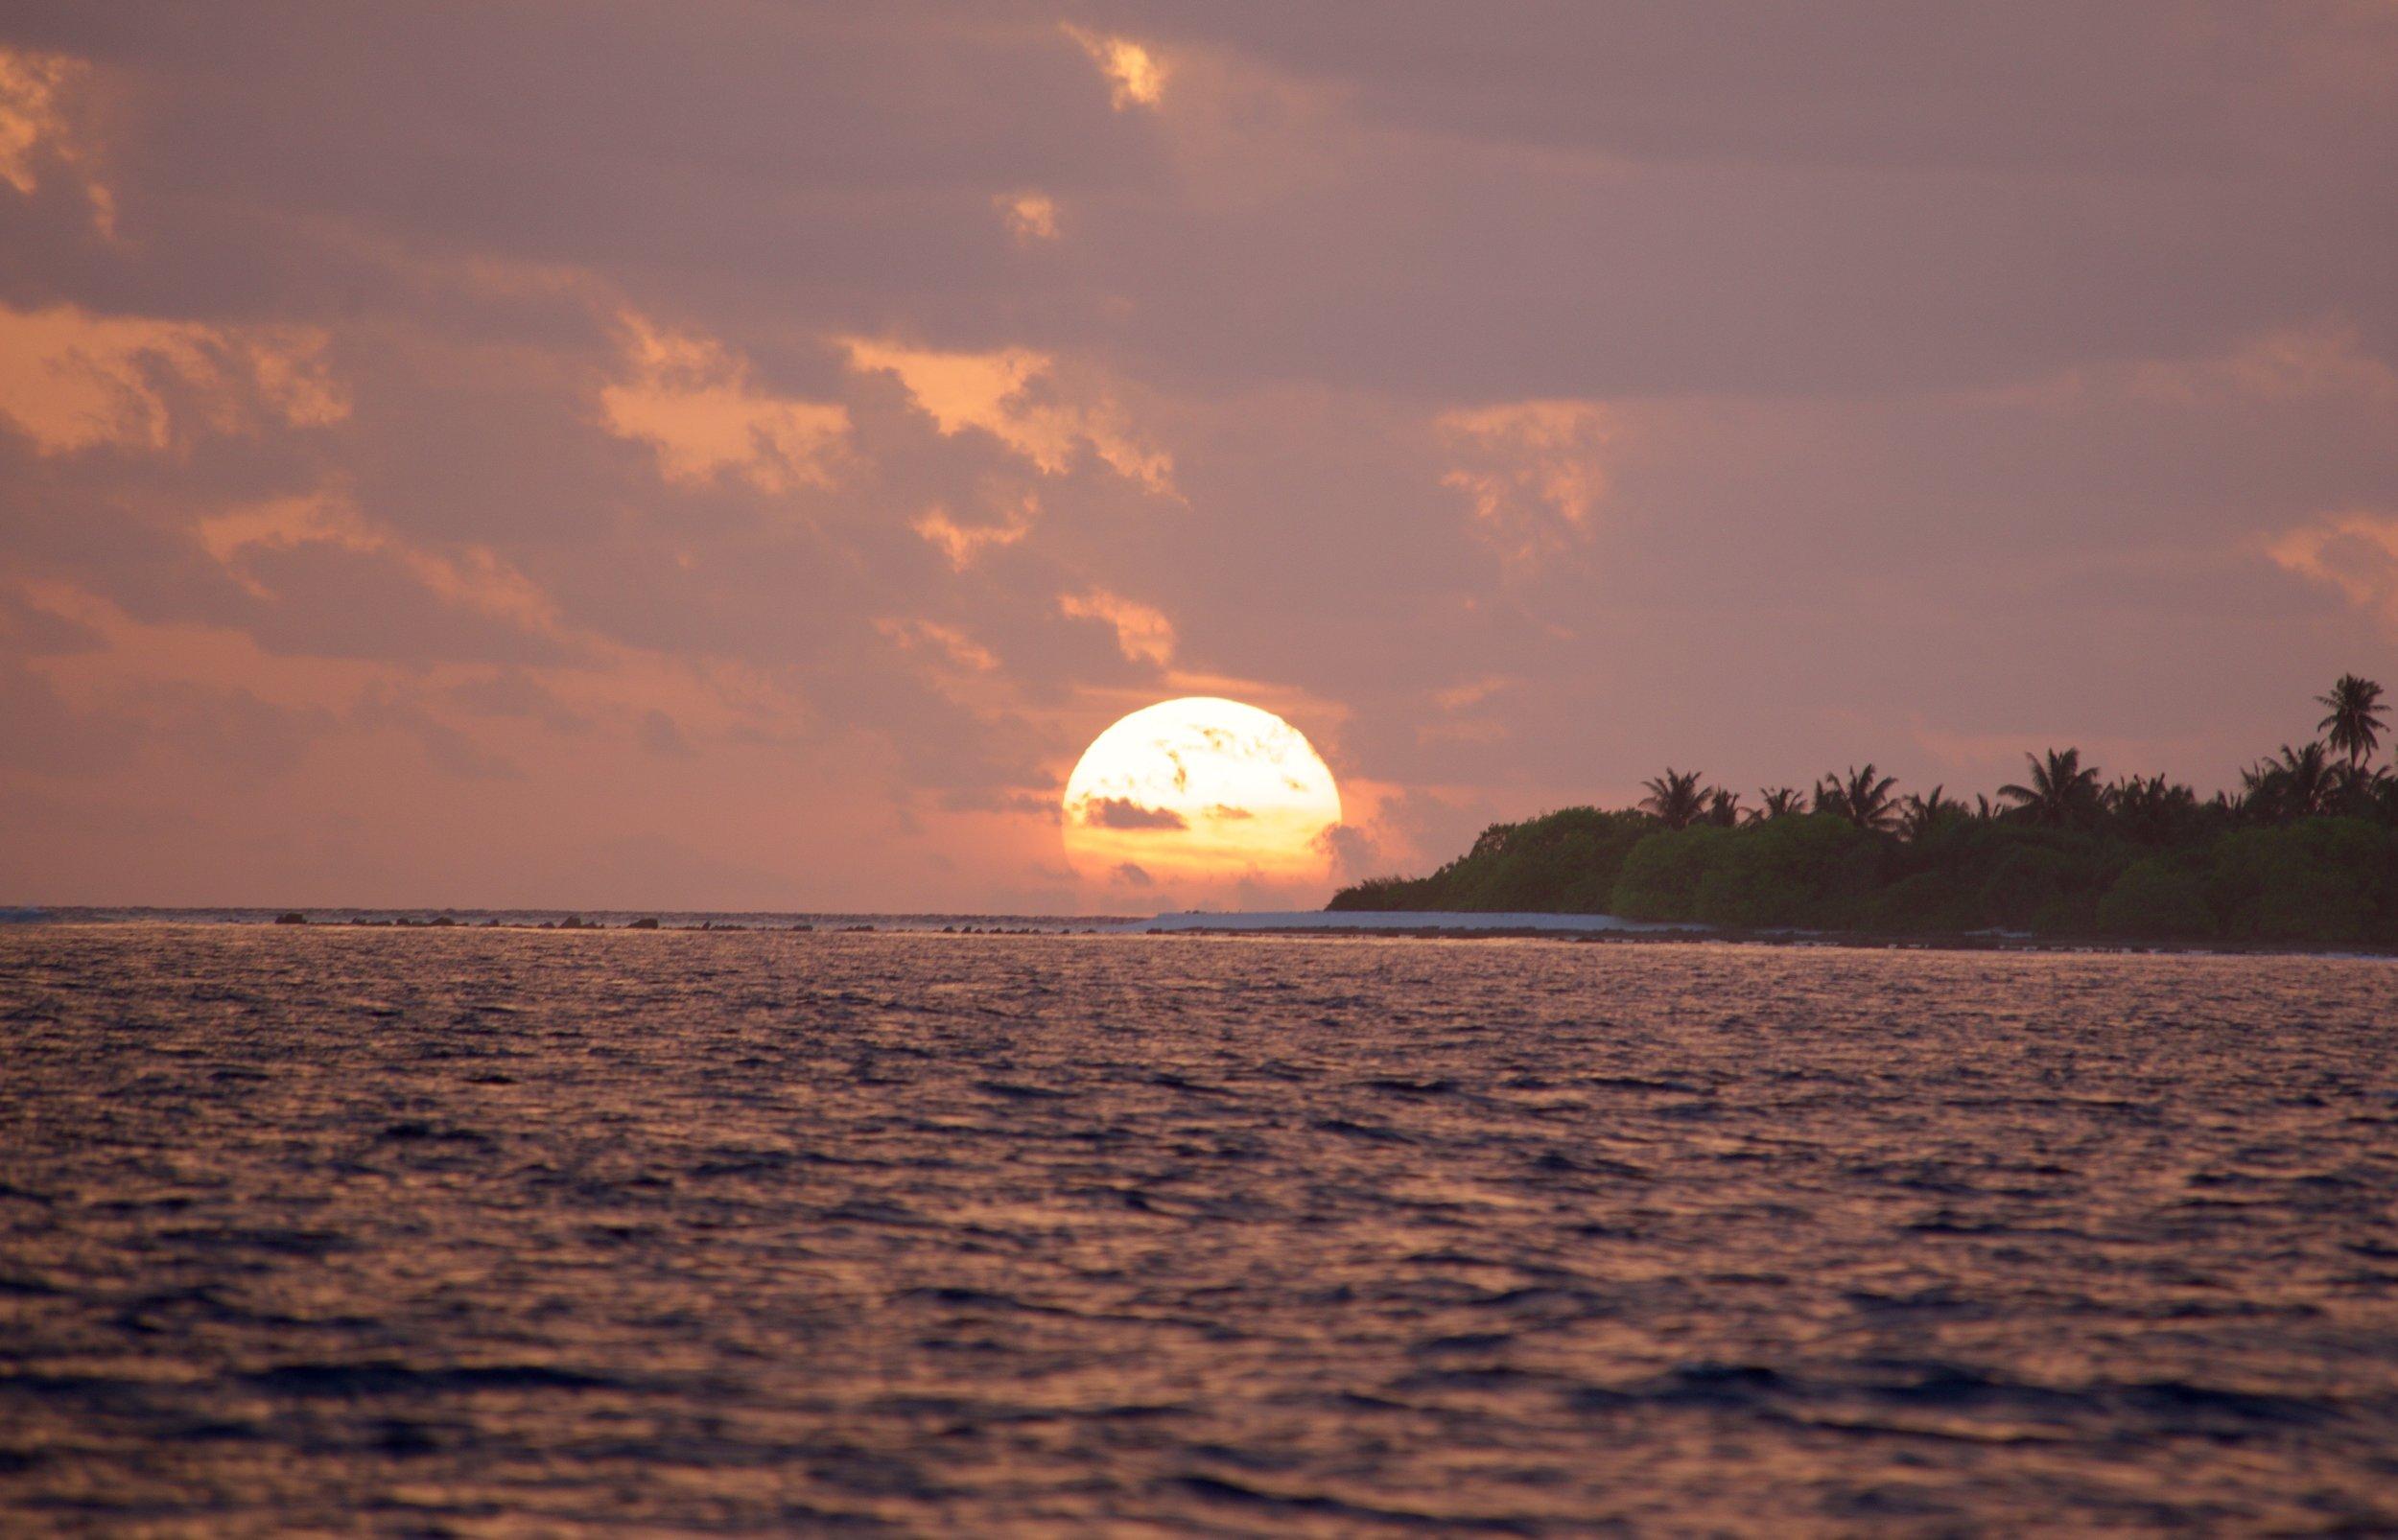 Copy of OA3 Sunset OMX